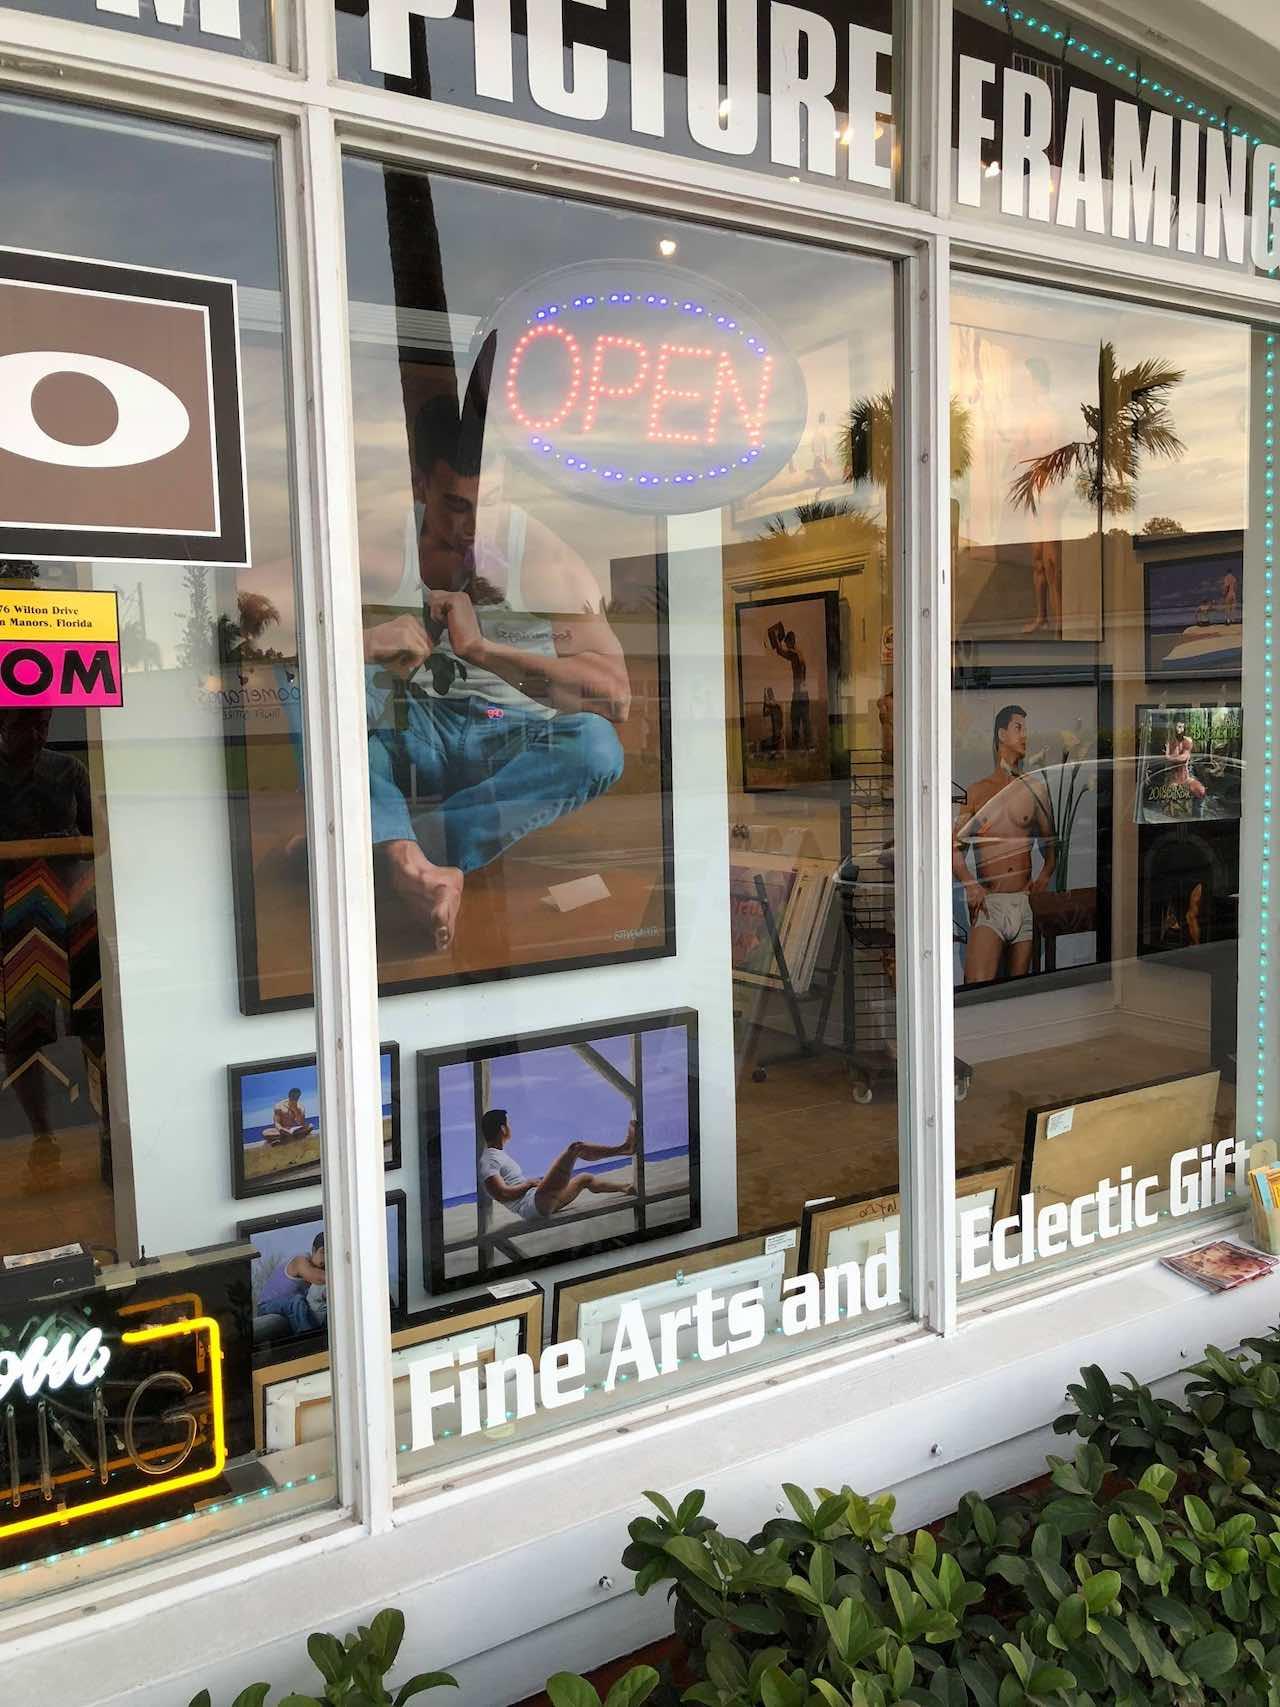 Gallery XO, Fort Lauderdale